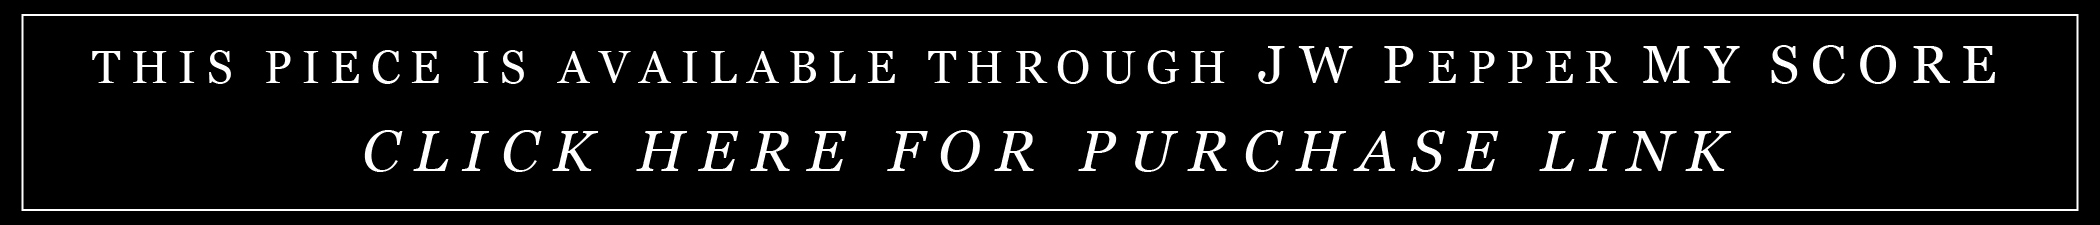 Purchase Banner - JW Pepper.jpg